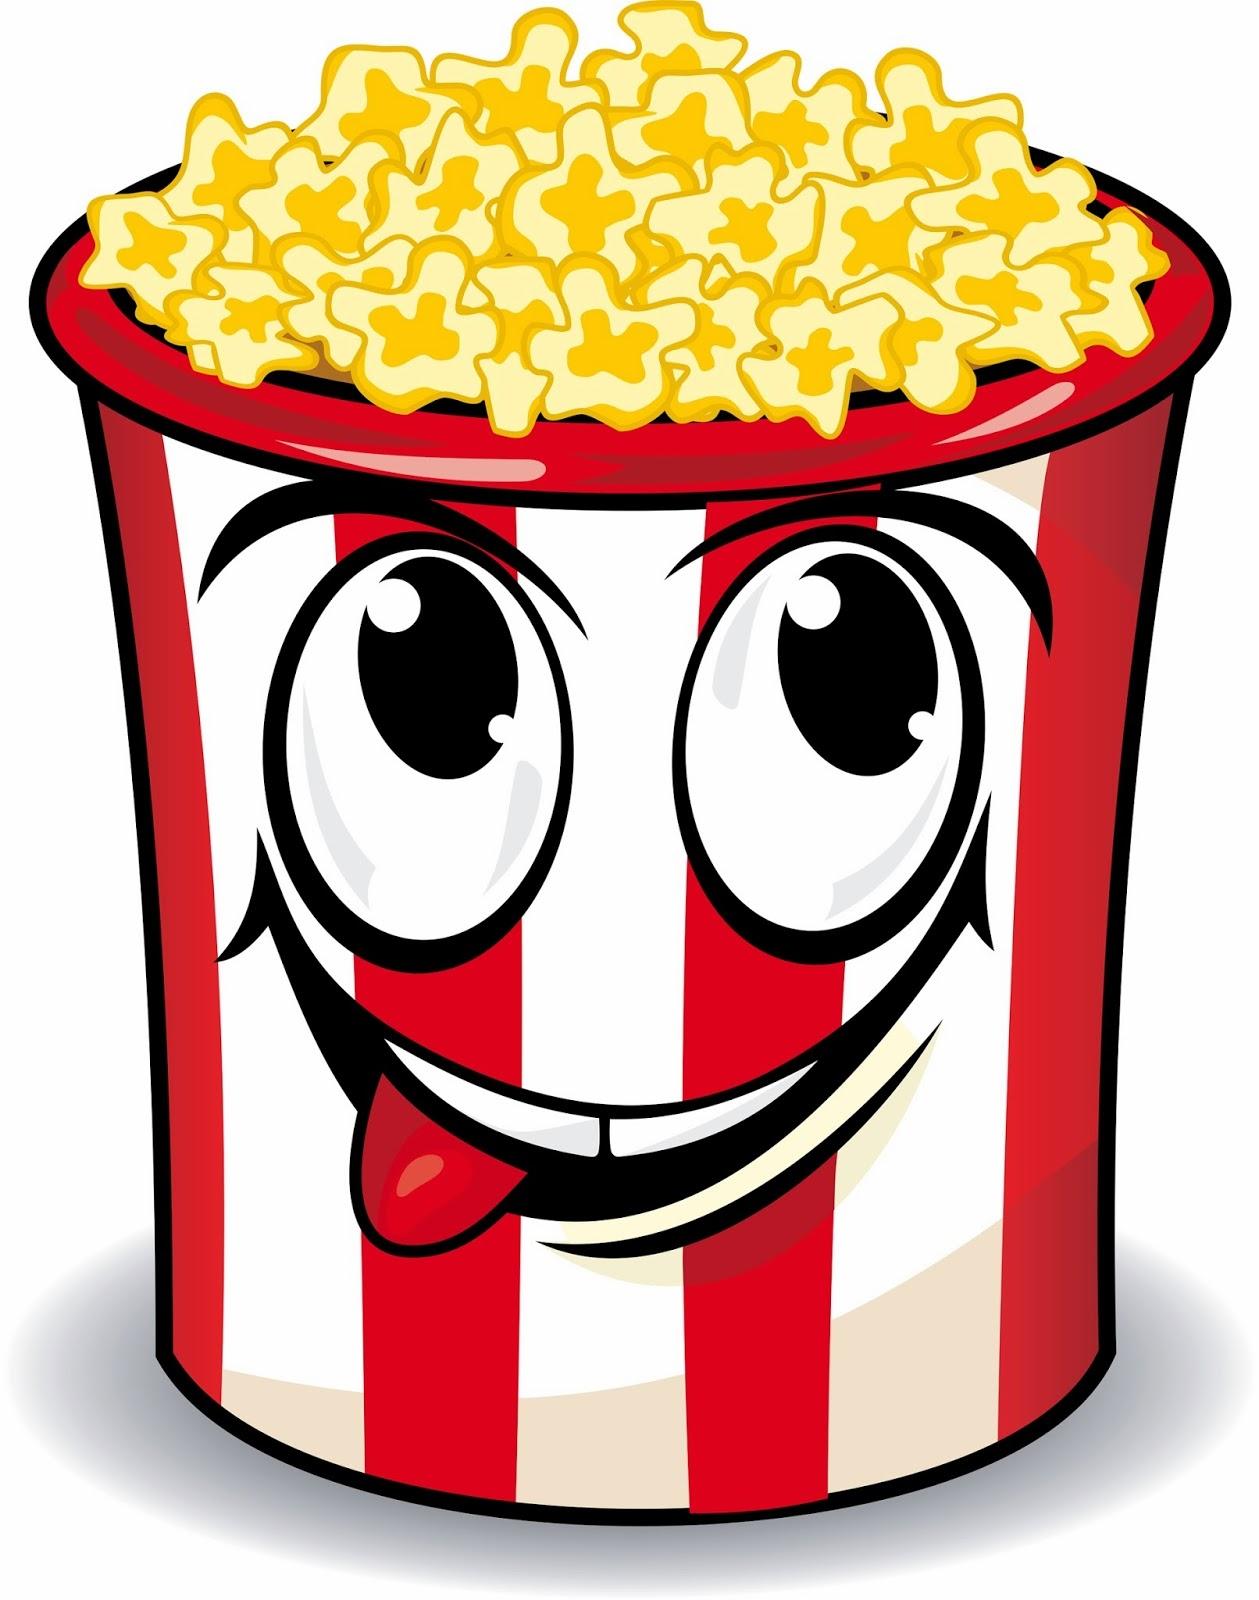 Cartoon popcorn clipart svg transparent download Popcorn clipart images – Gclipart.com svg transparent download